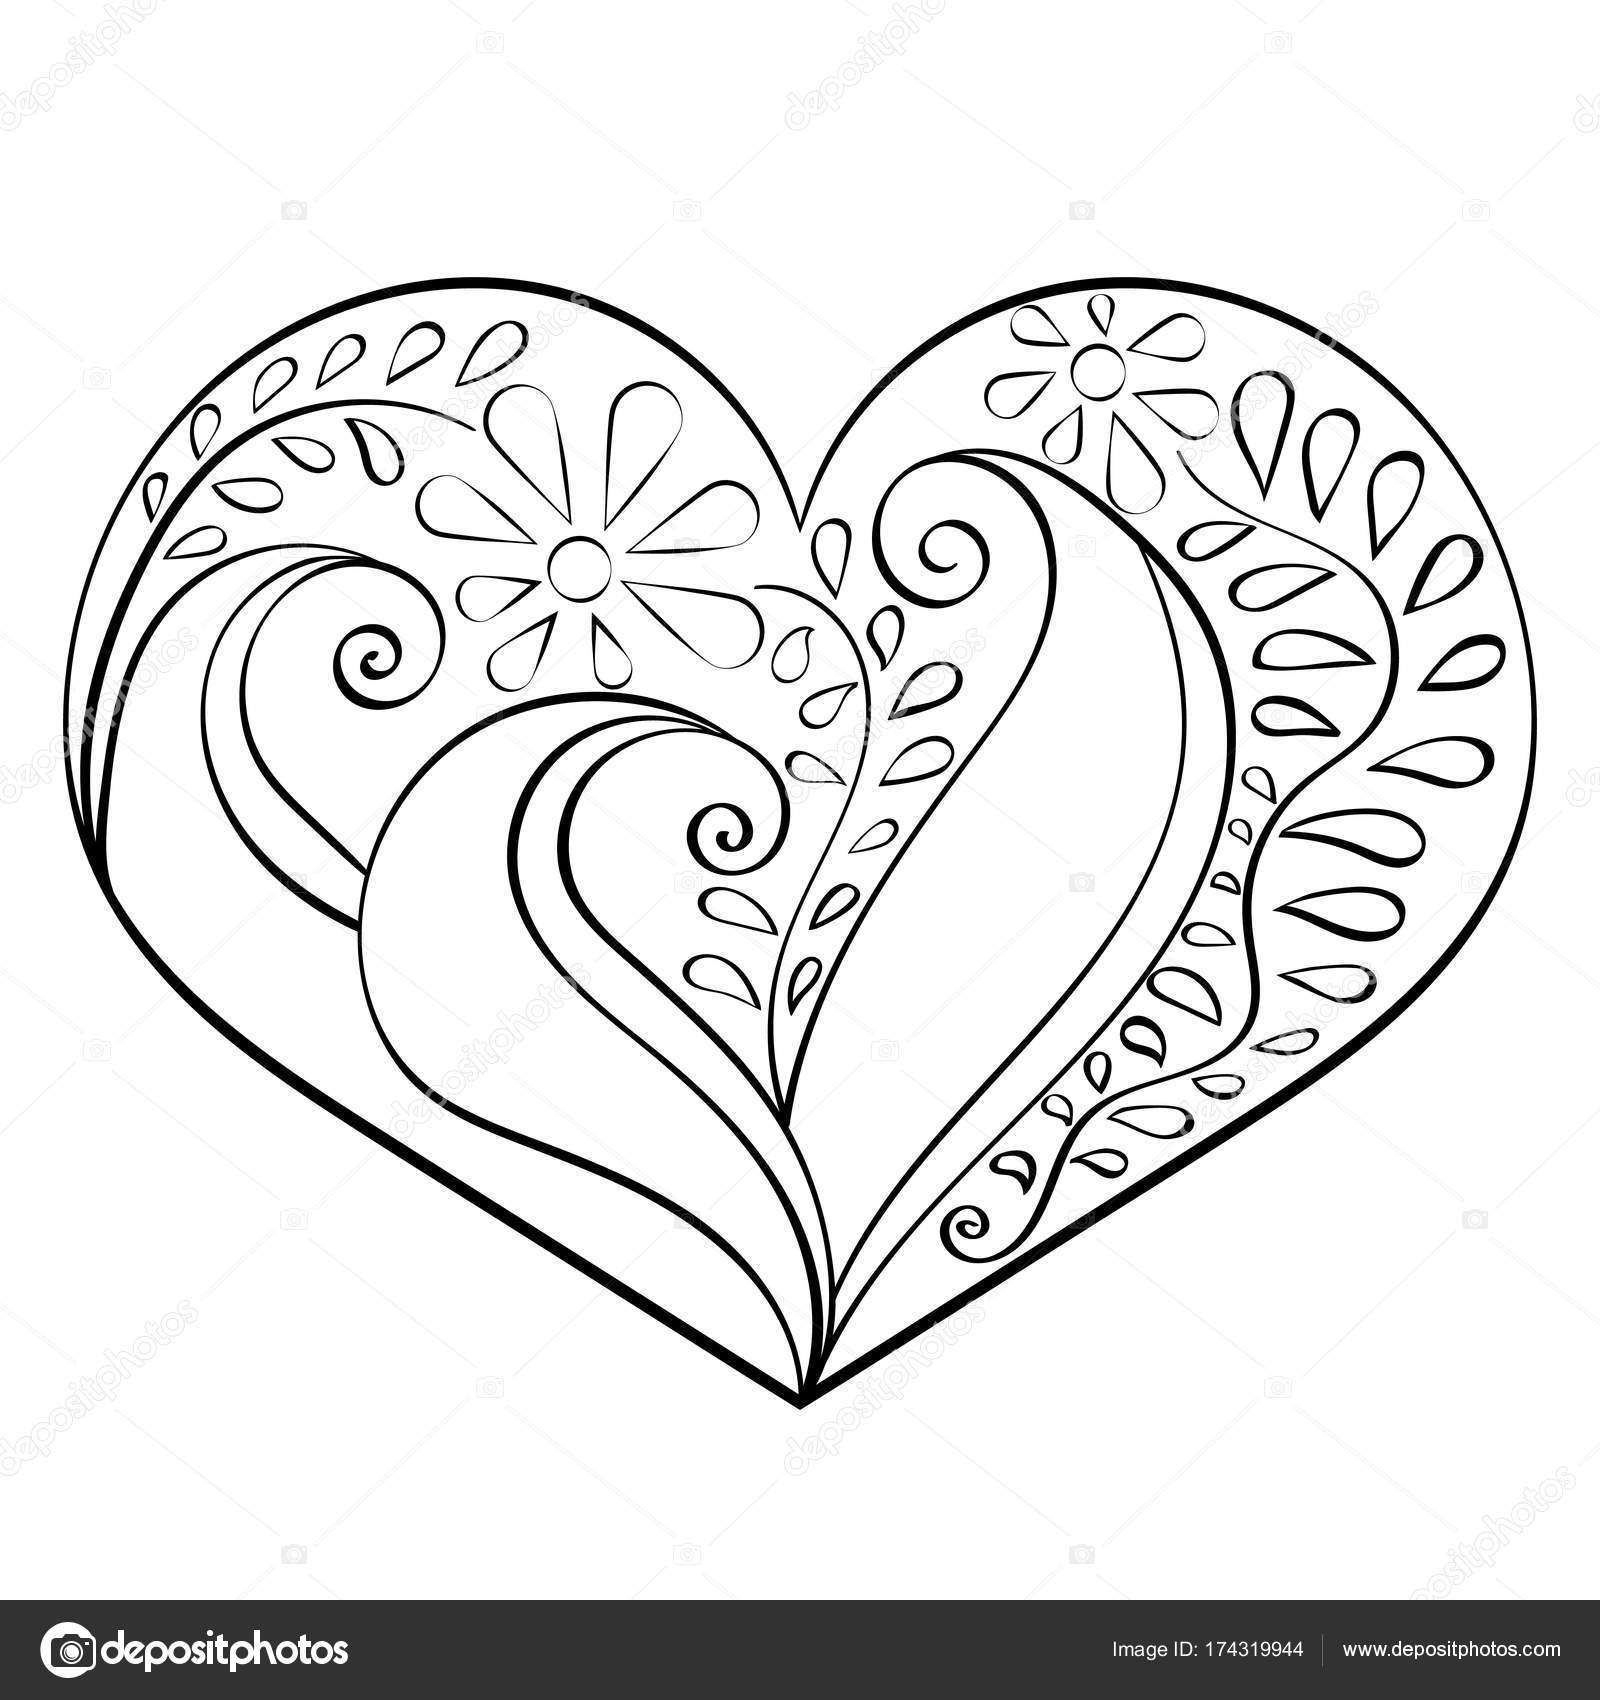 Corazón abstracto dibujado a mano con dibujo de India, vector ...